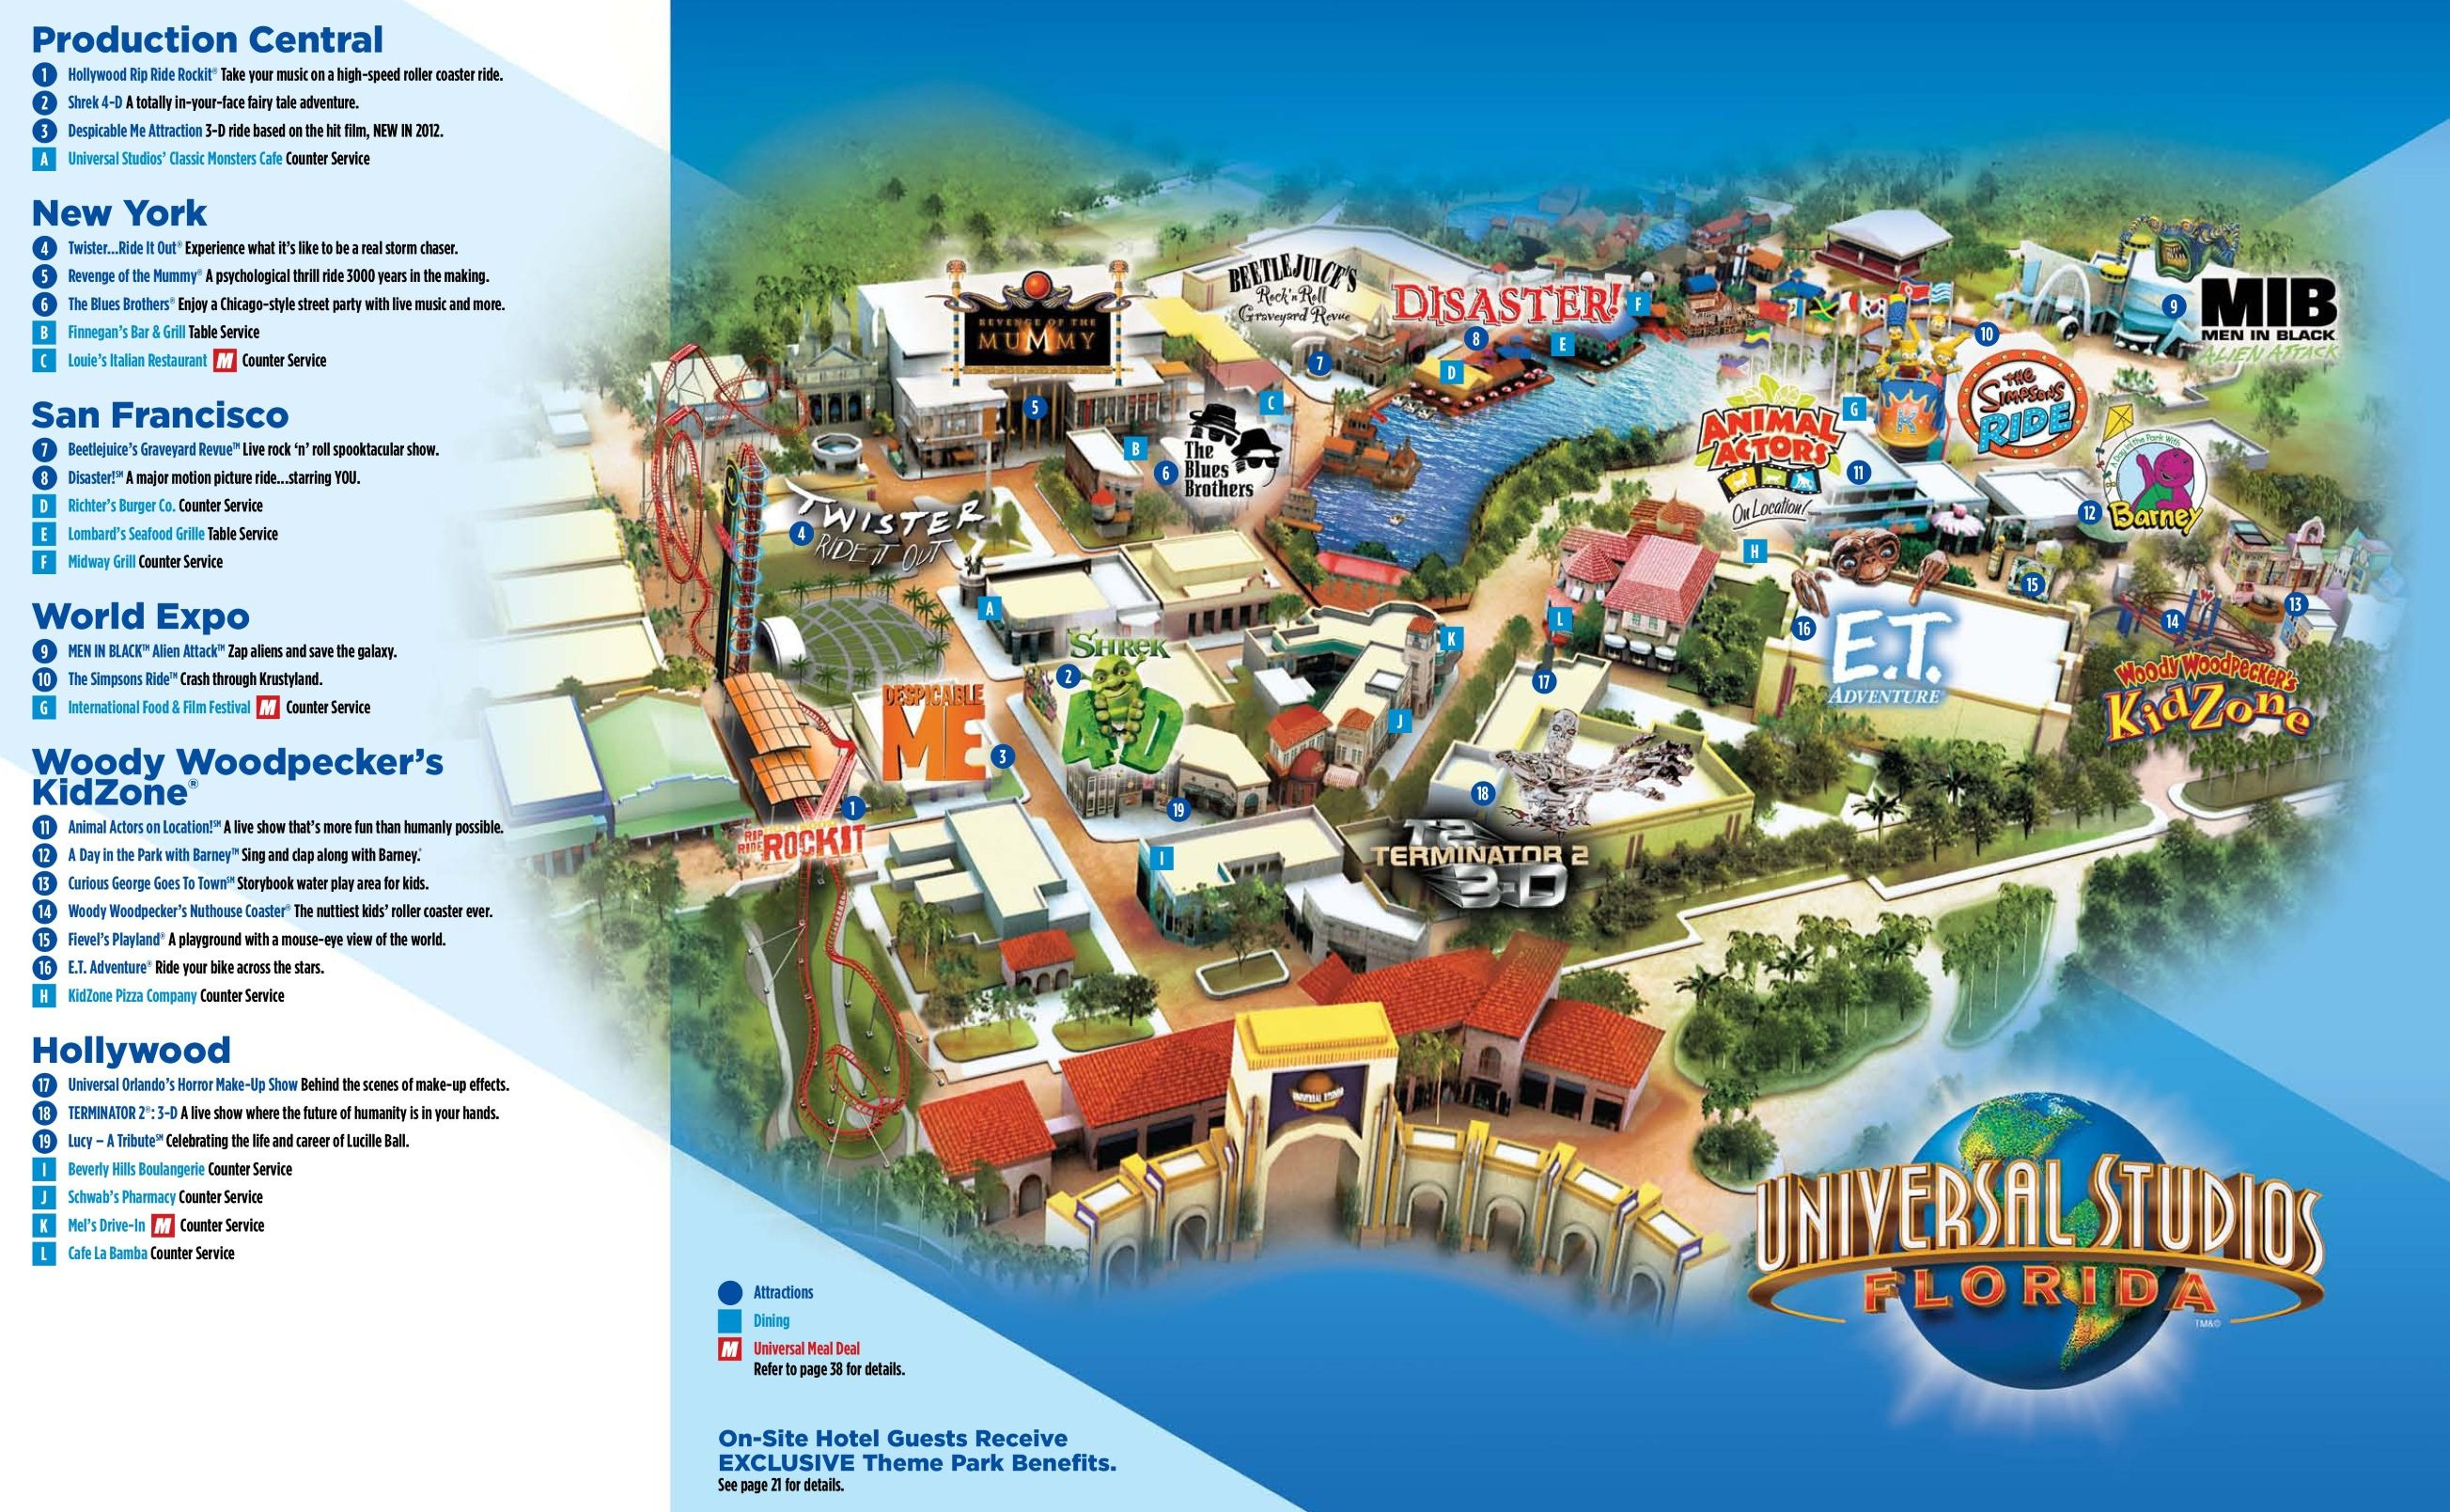 Orlando Universal Studios Florida Map | Travel: Orlando, Fl - Universal Studios Florida Hotel Map